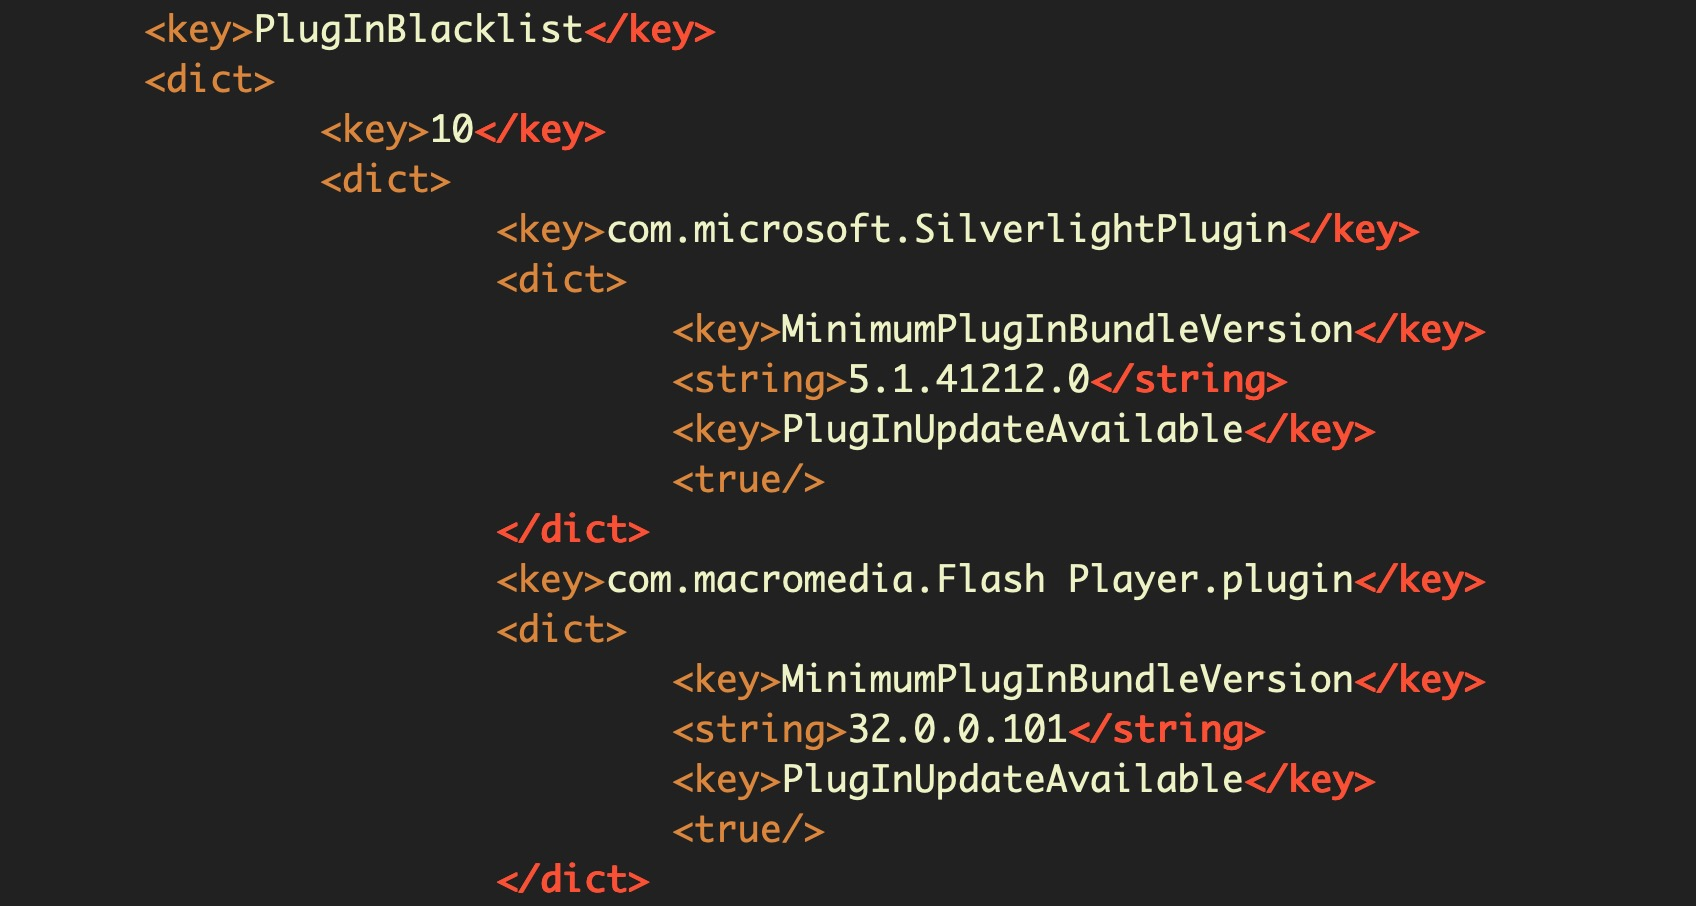 image of plug-in blacklist